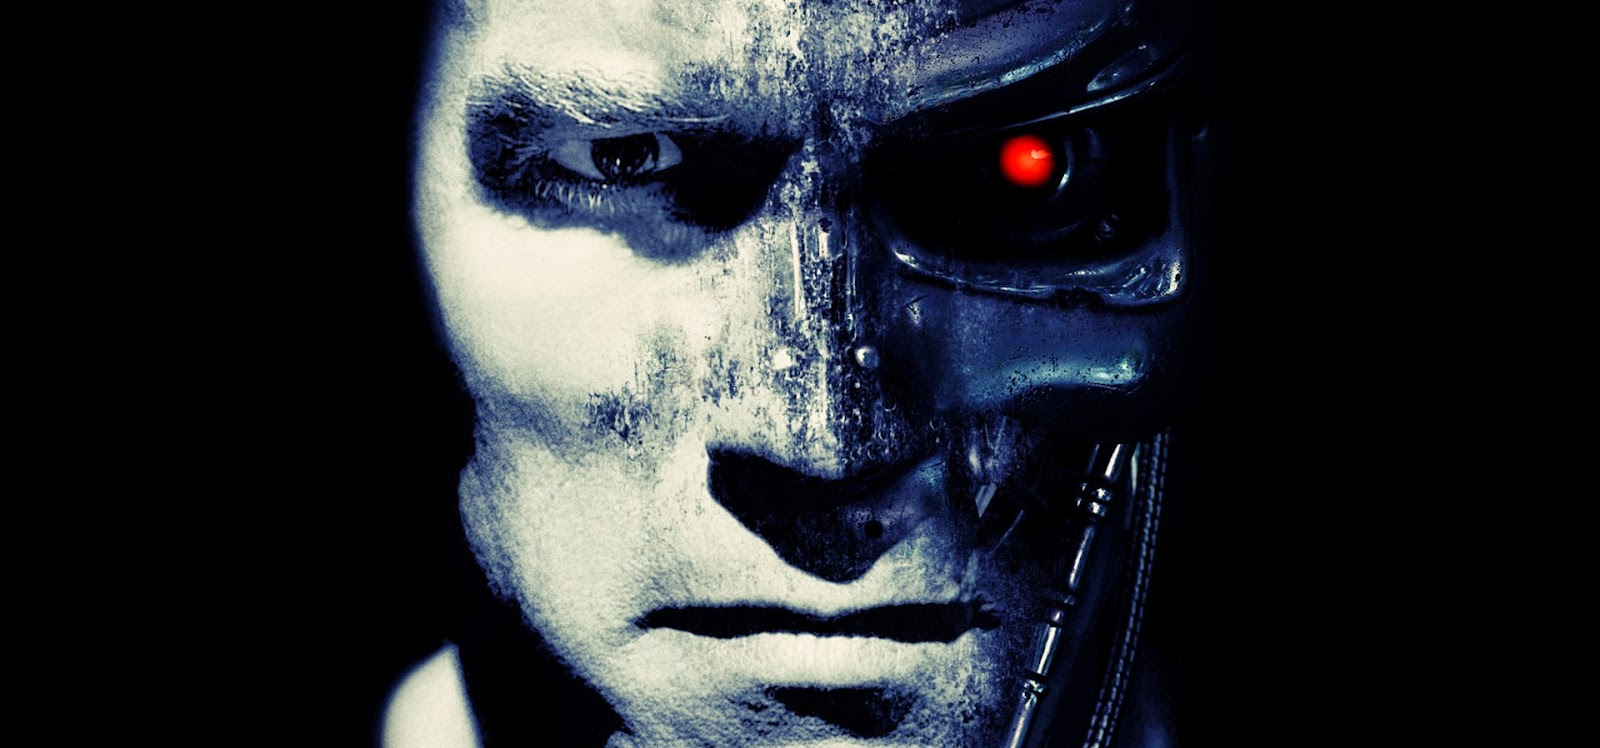 Schwarzenegger anuncia término das filmagens de Exterminador 5 com foto nos bastidores revelando novo título